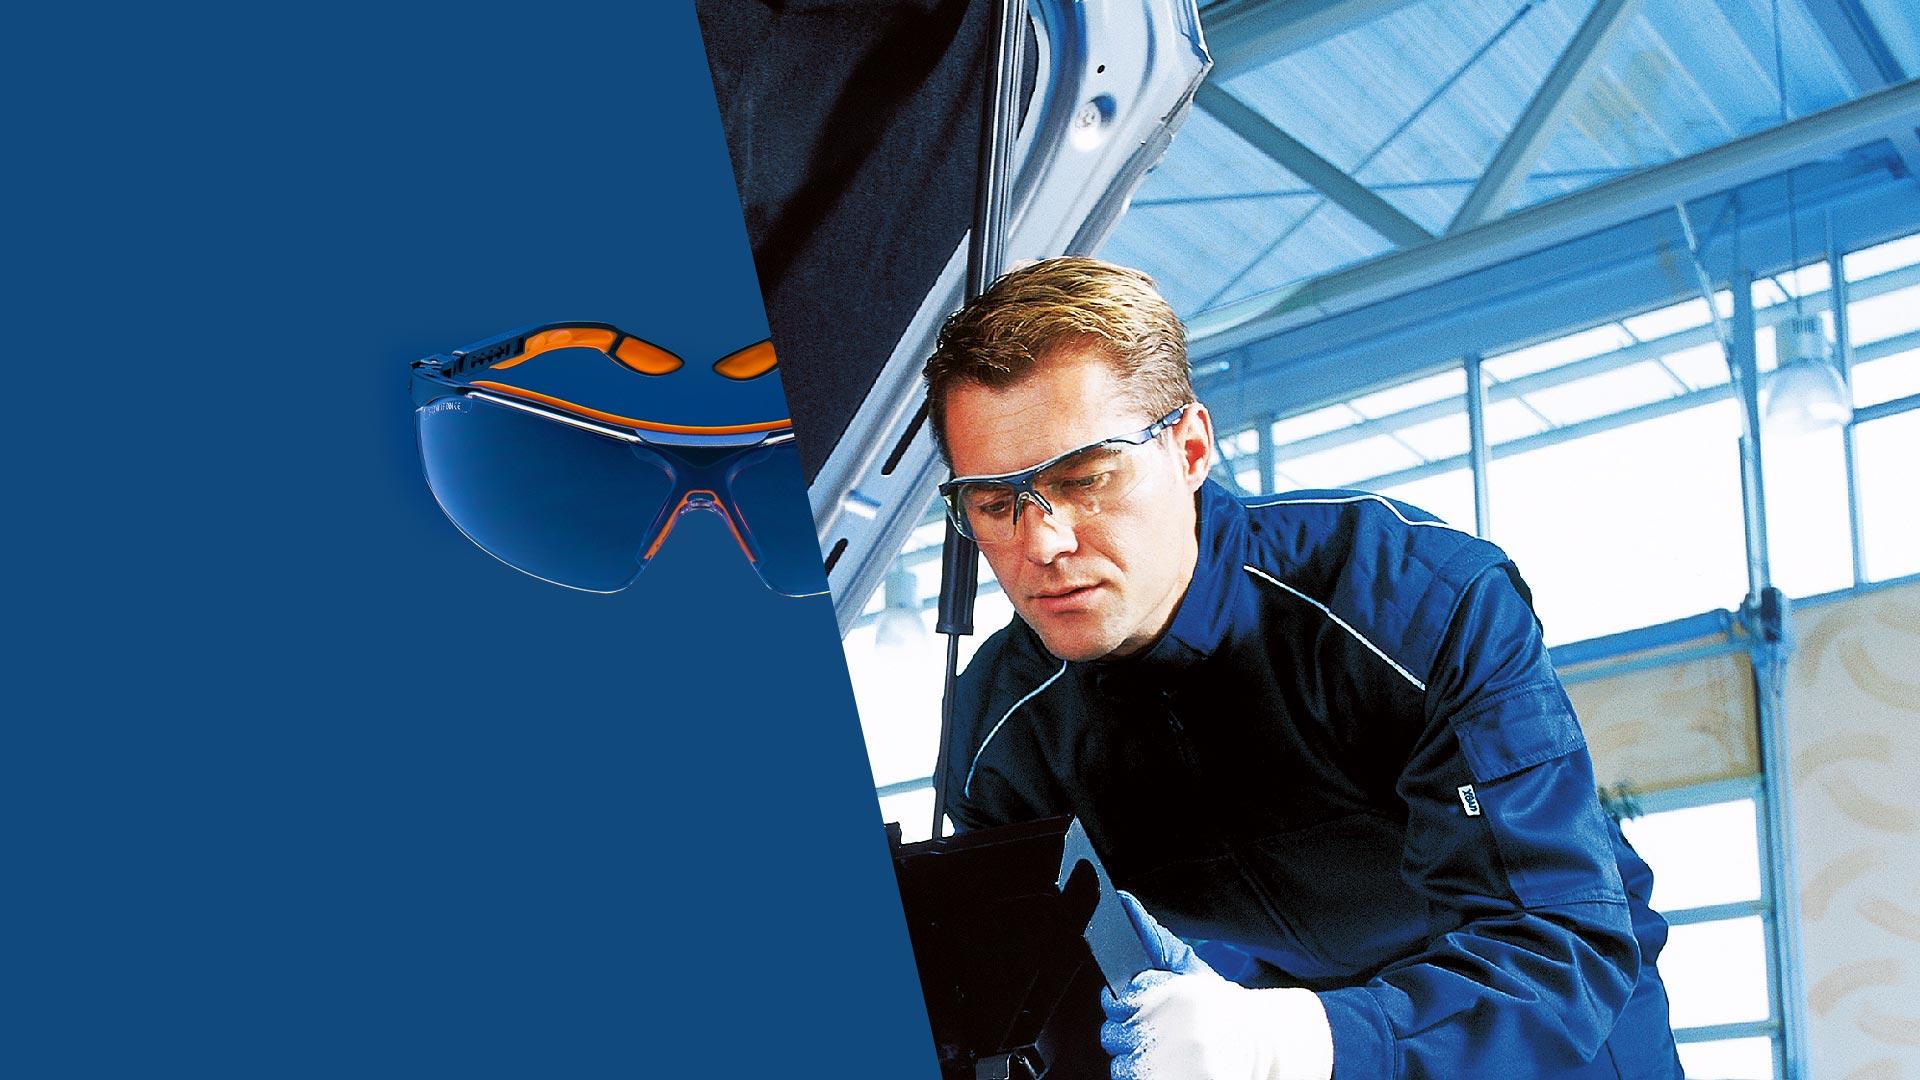 uvex i-vo safety spectacles